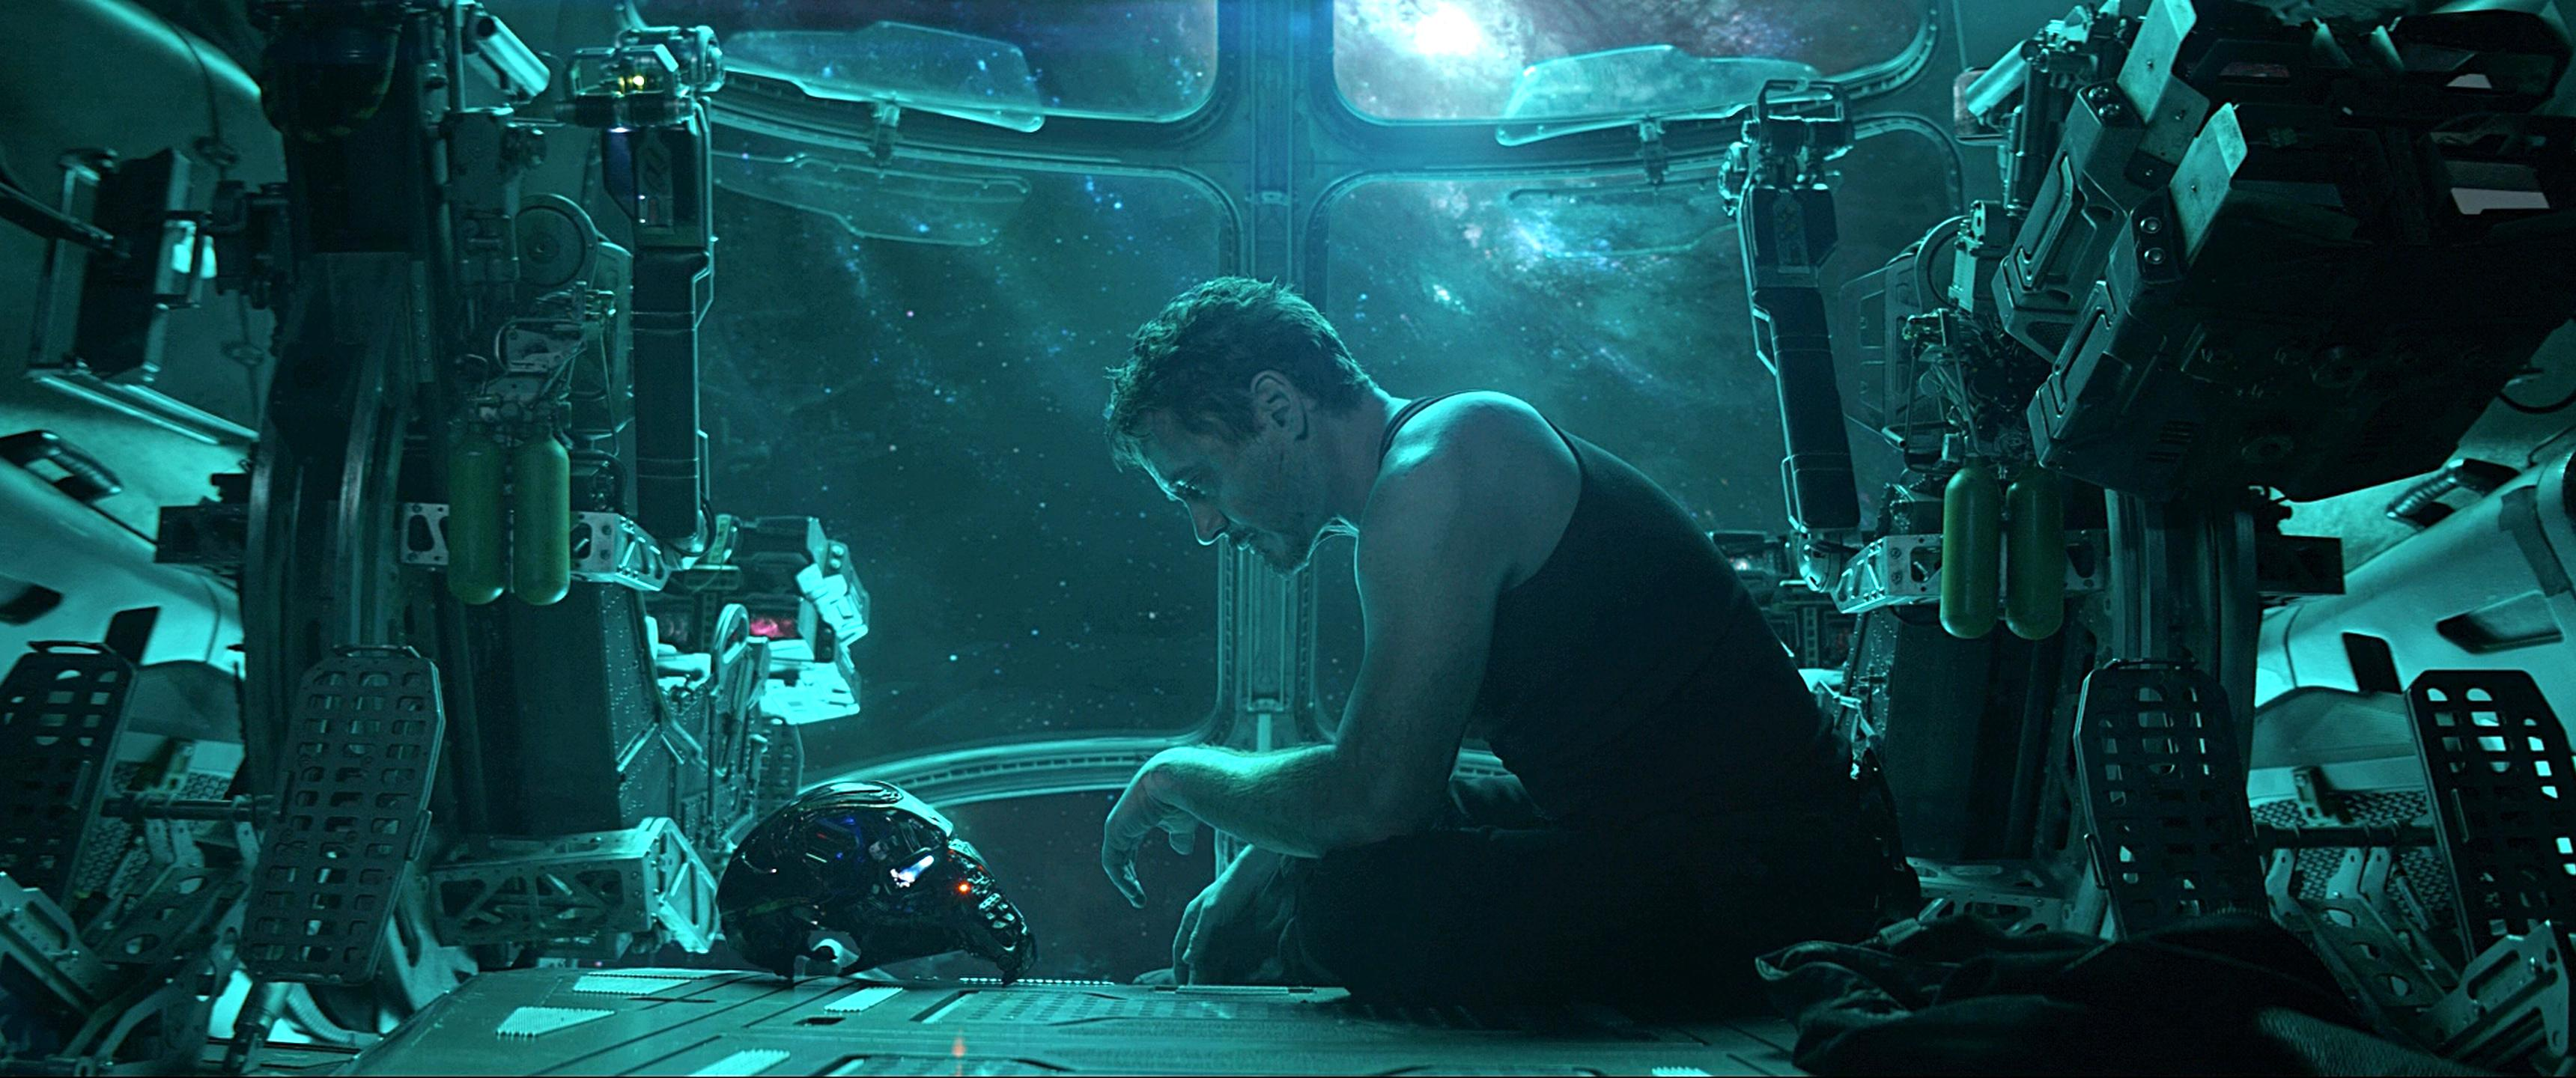 Tony Stark in space from Avengers Endgame trailer [3440x1440 3440x1440